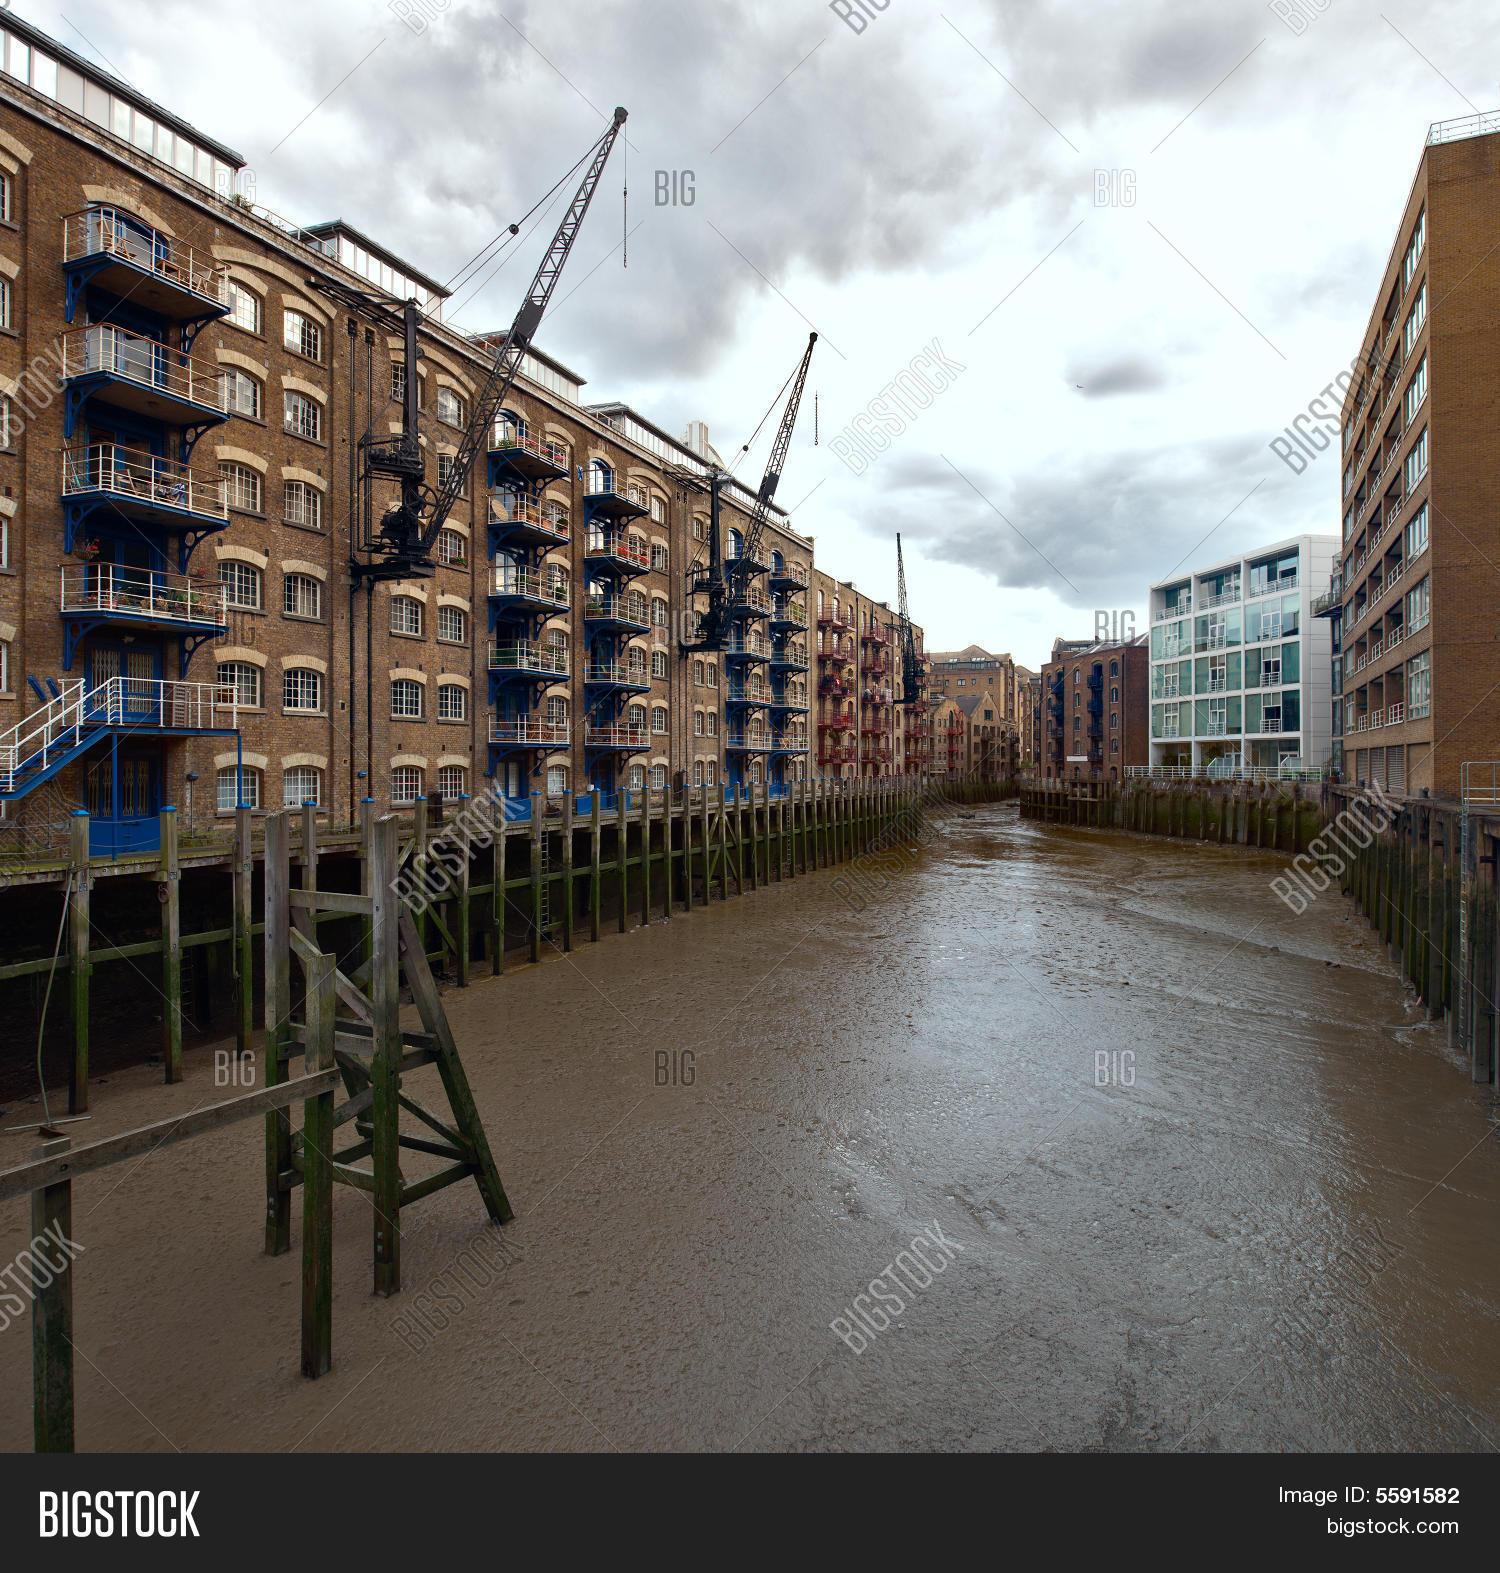 New Concordia Wharf Image & Photo (Free Trial)